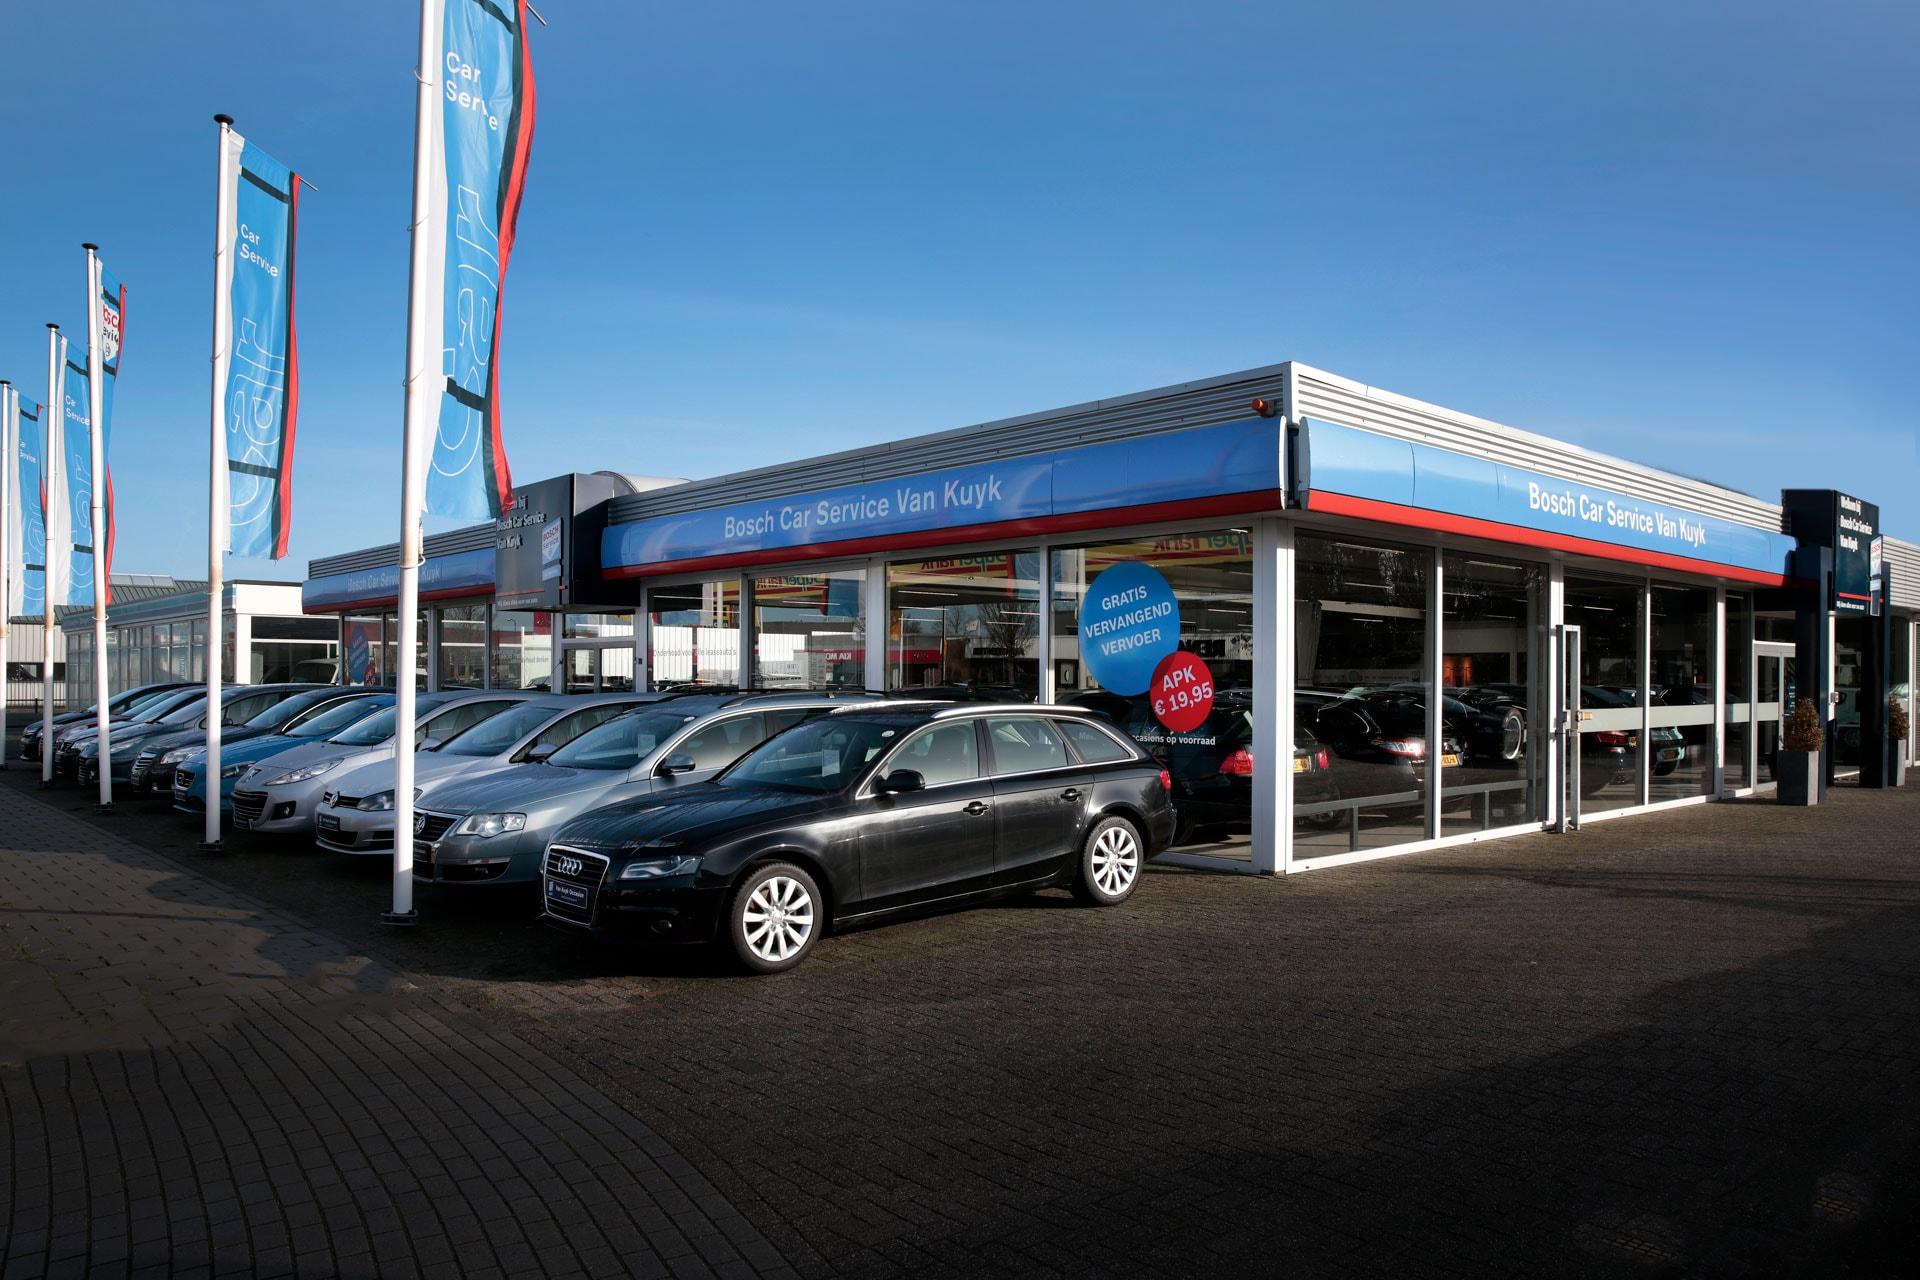 Bosch Car Service Van Kuyk